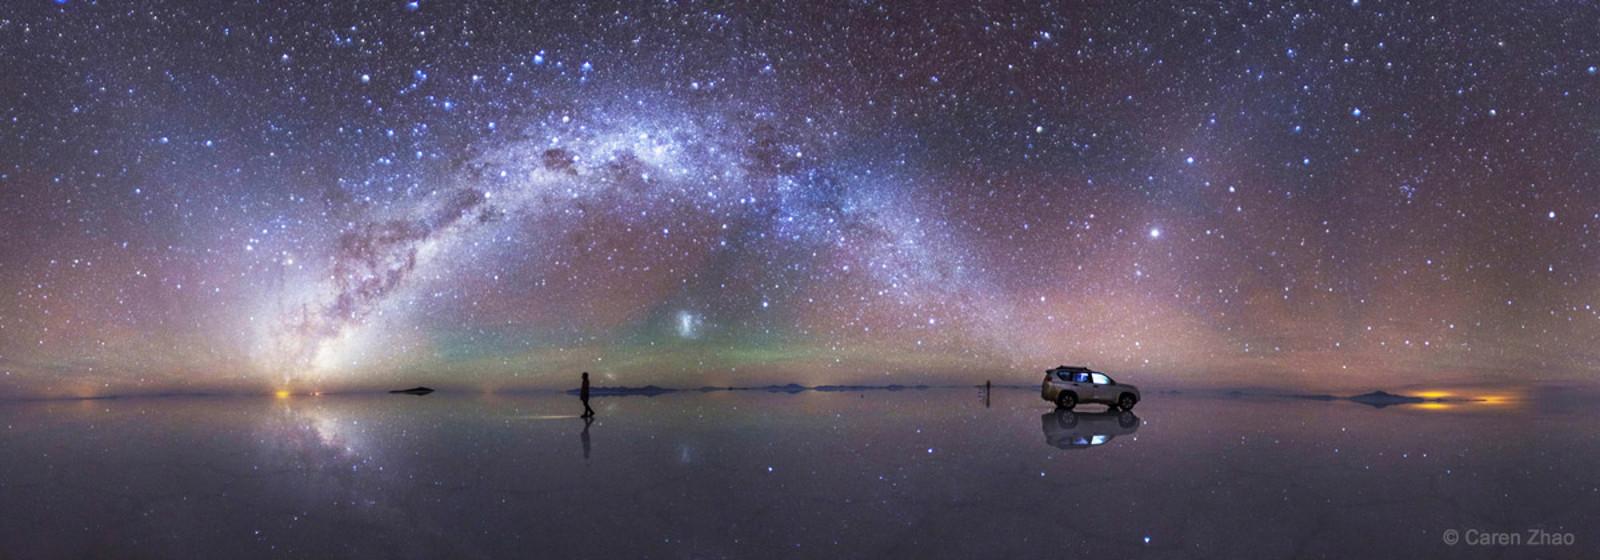 """Strolls in the Star River"" in the Bolivian Salar de Uyuni by Caren Zhao"